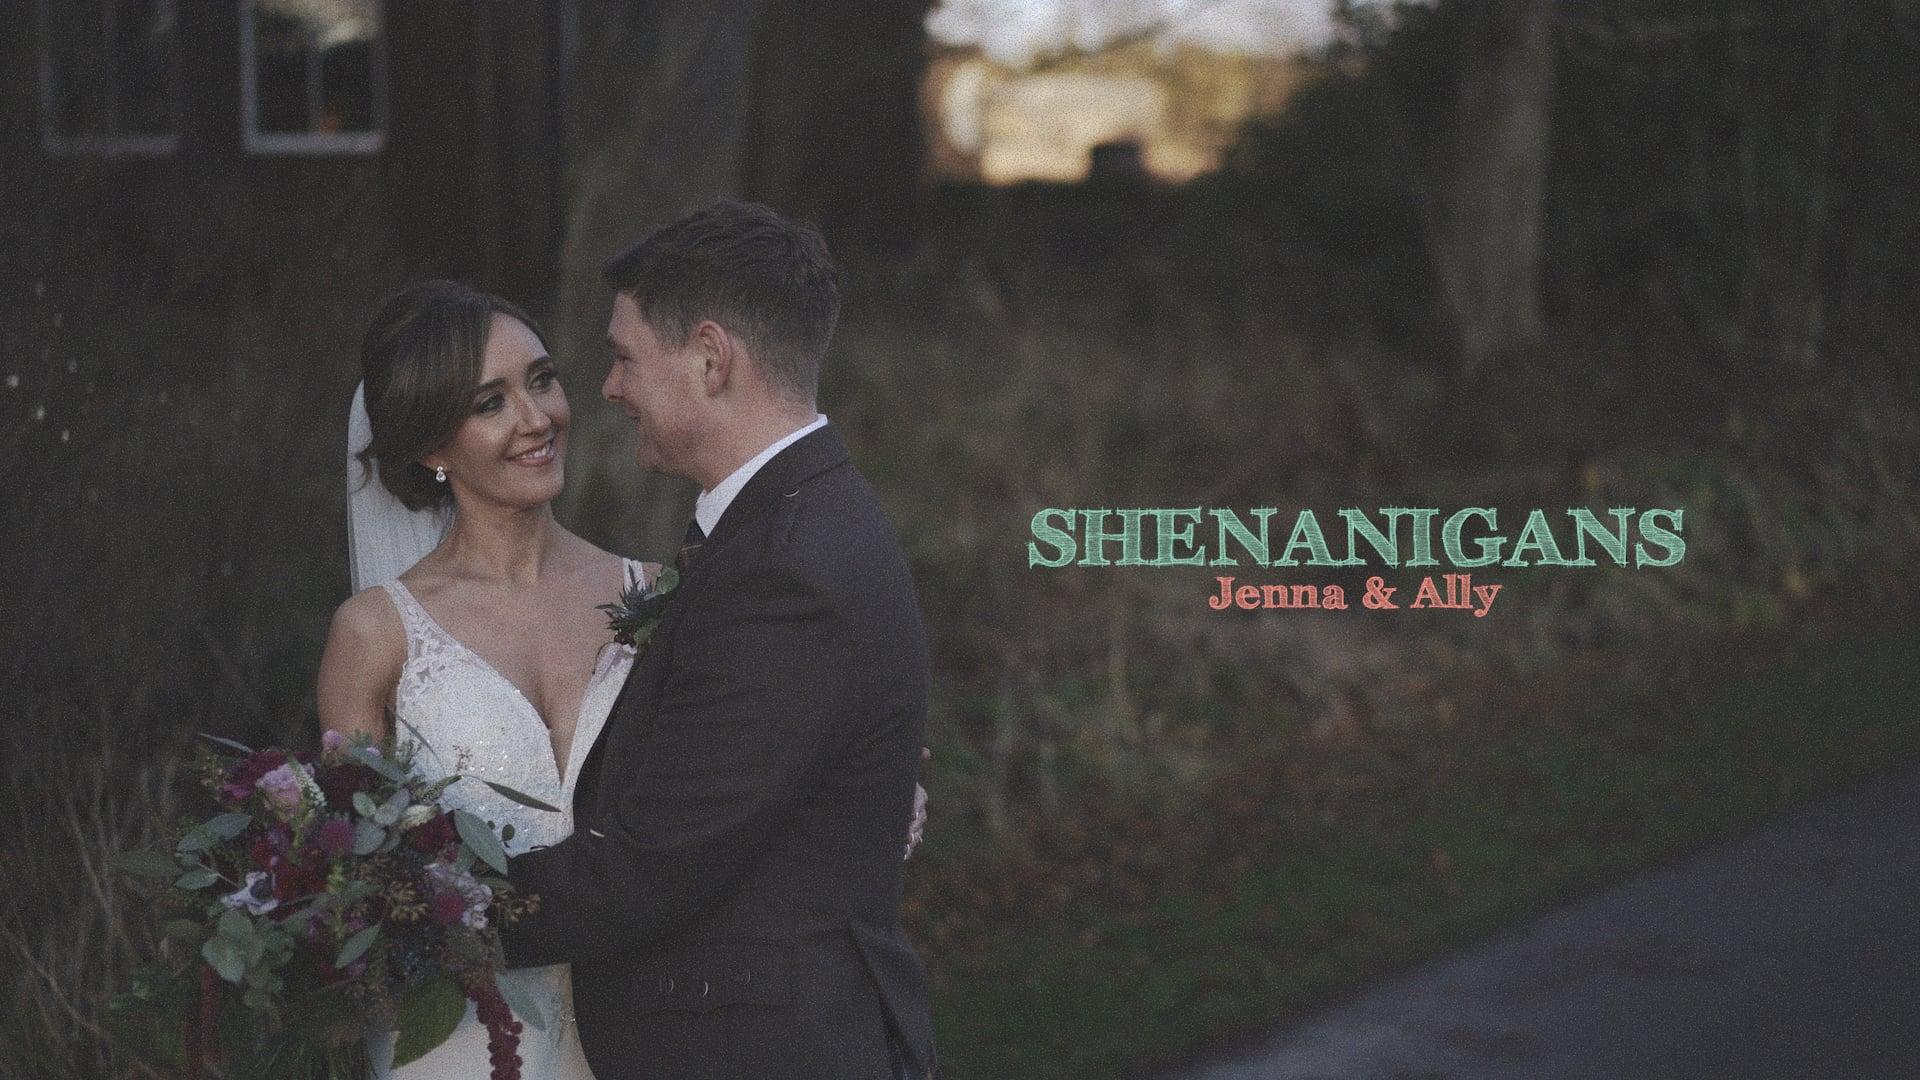 Shenanigans by Jenna and Ally